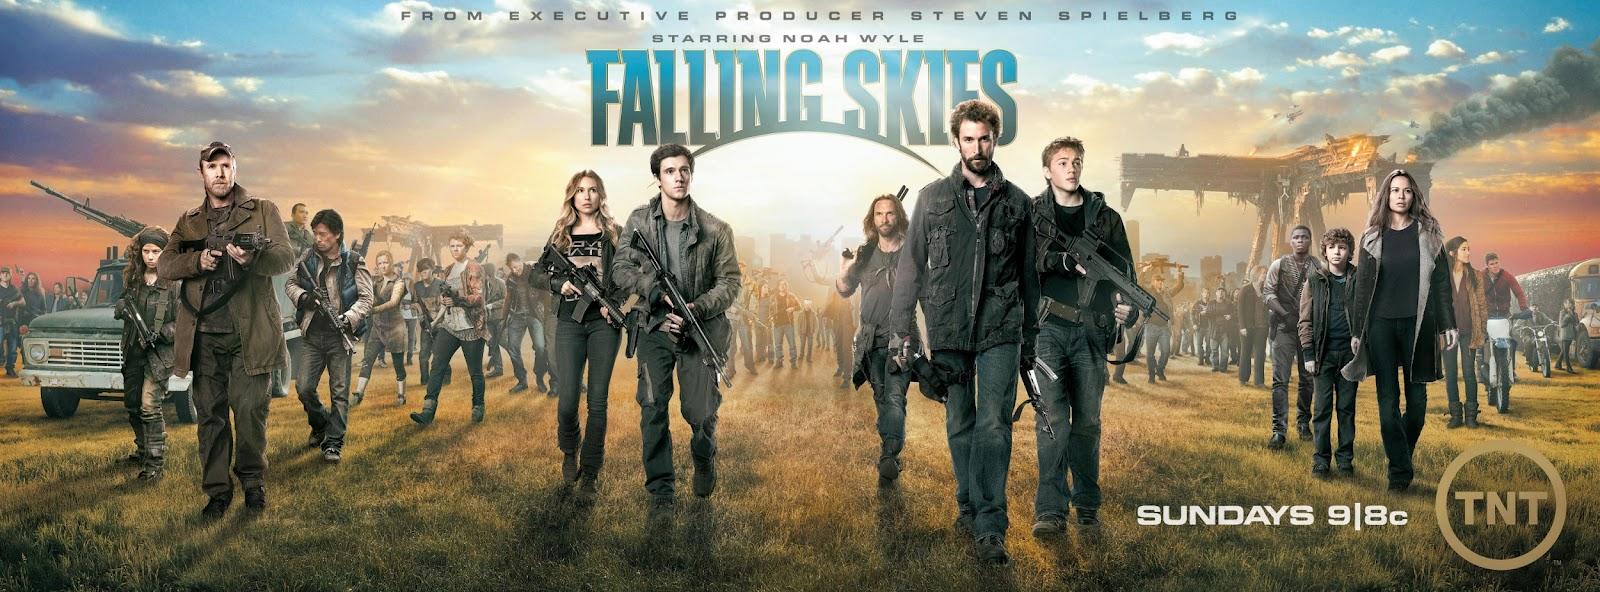 Ascolti Usa: i debutti di Falling Skies 2, Snooki & JWoww, Suits 2 e Burn Notice 6